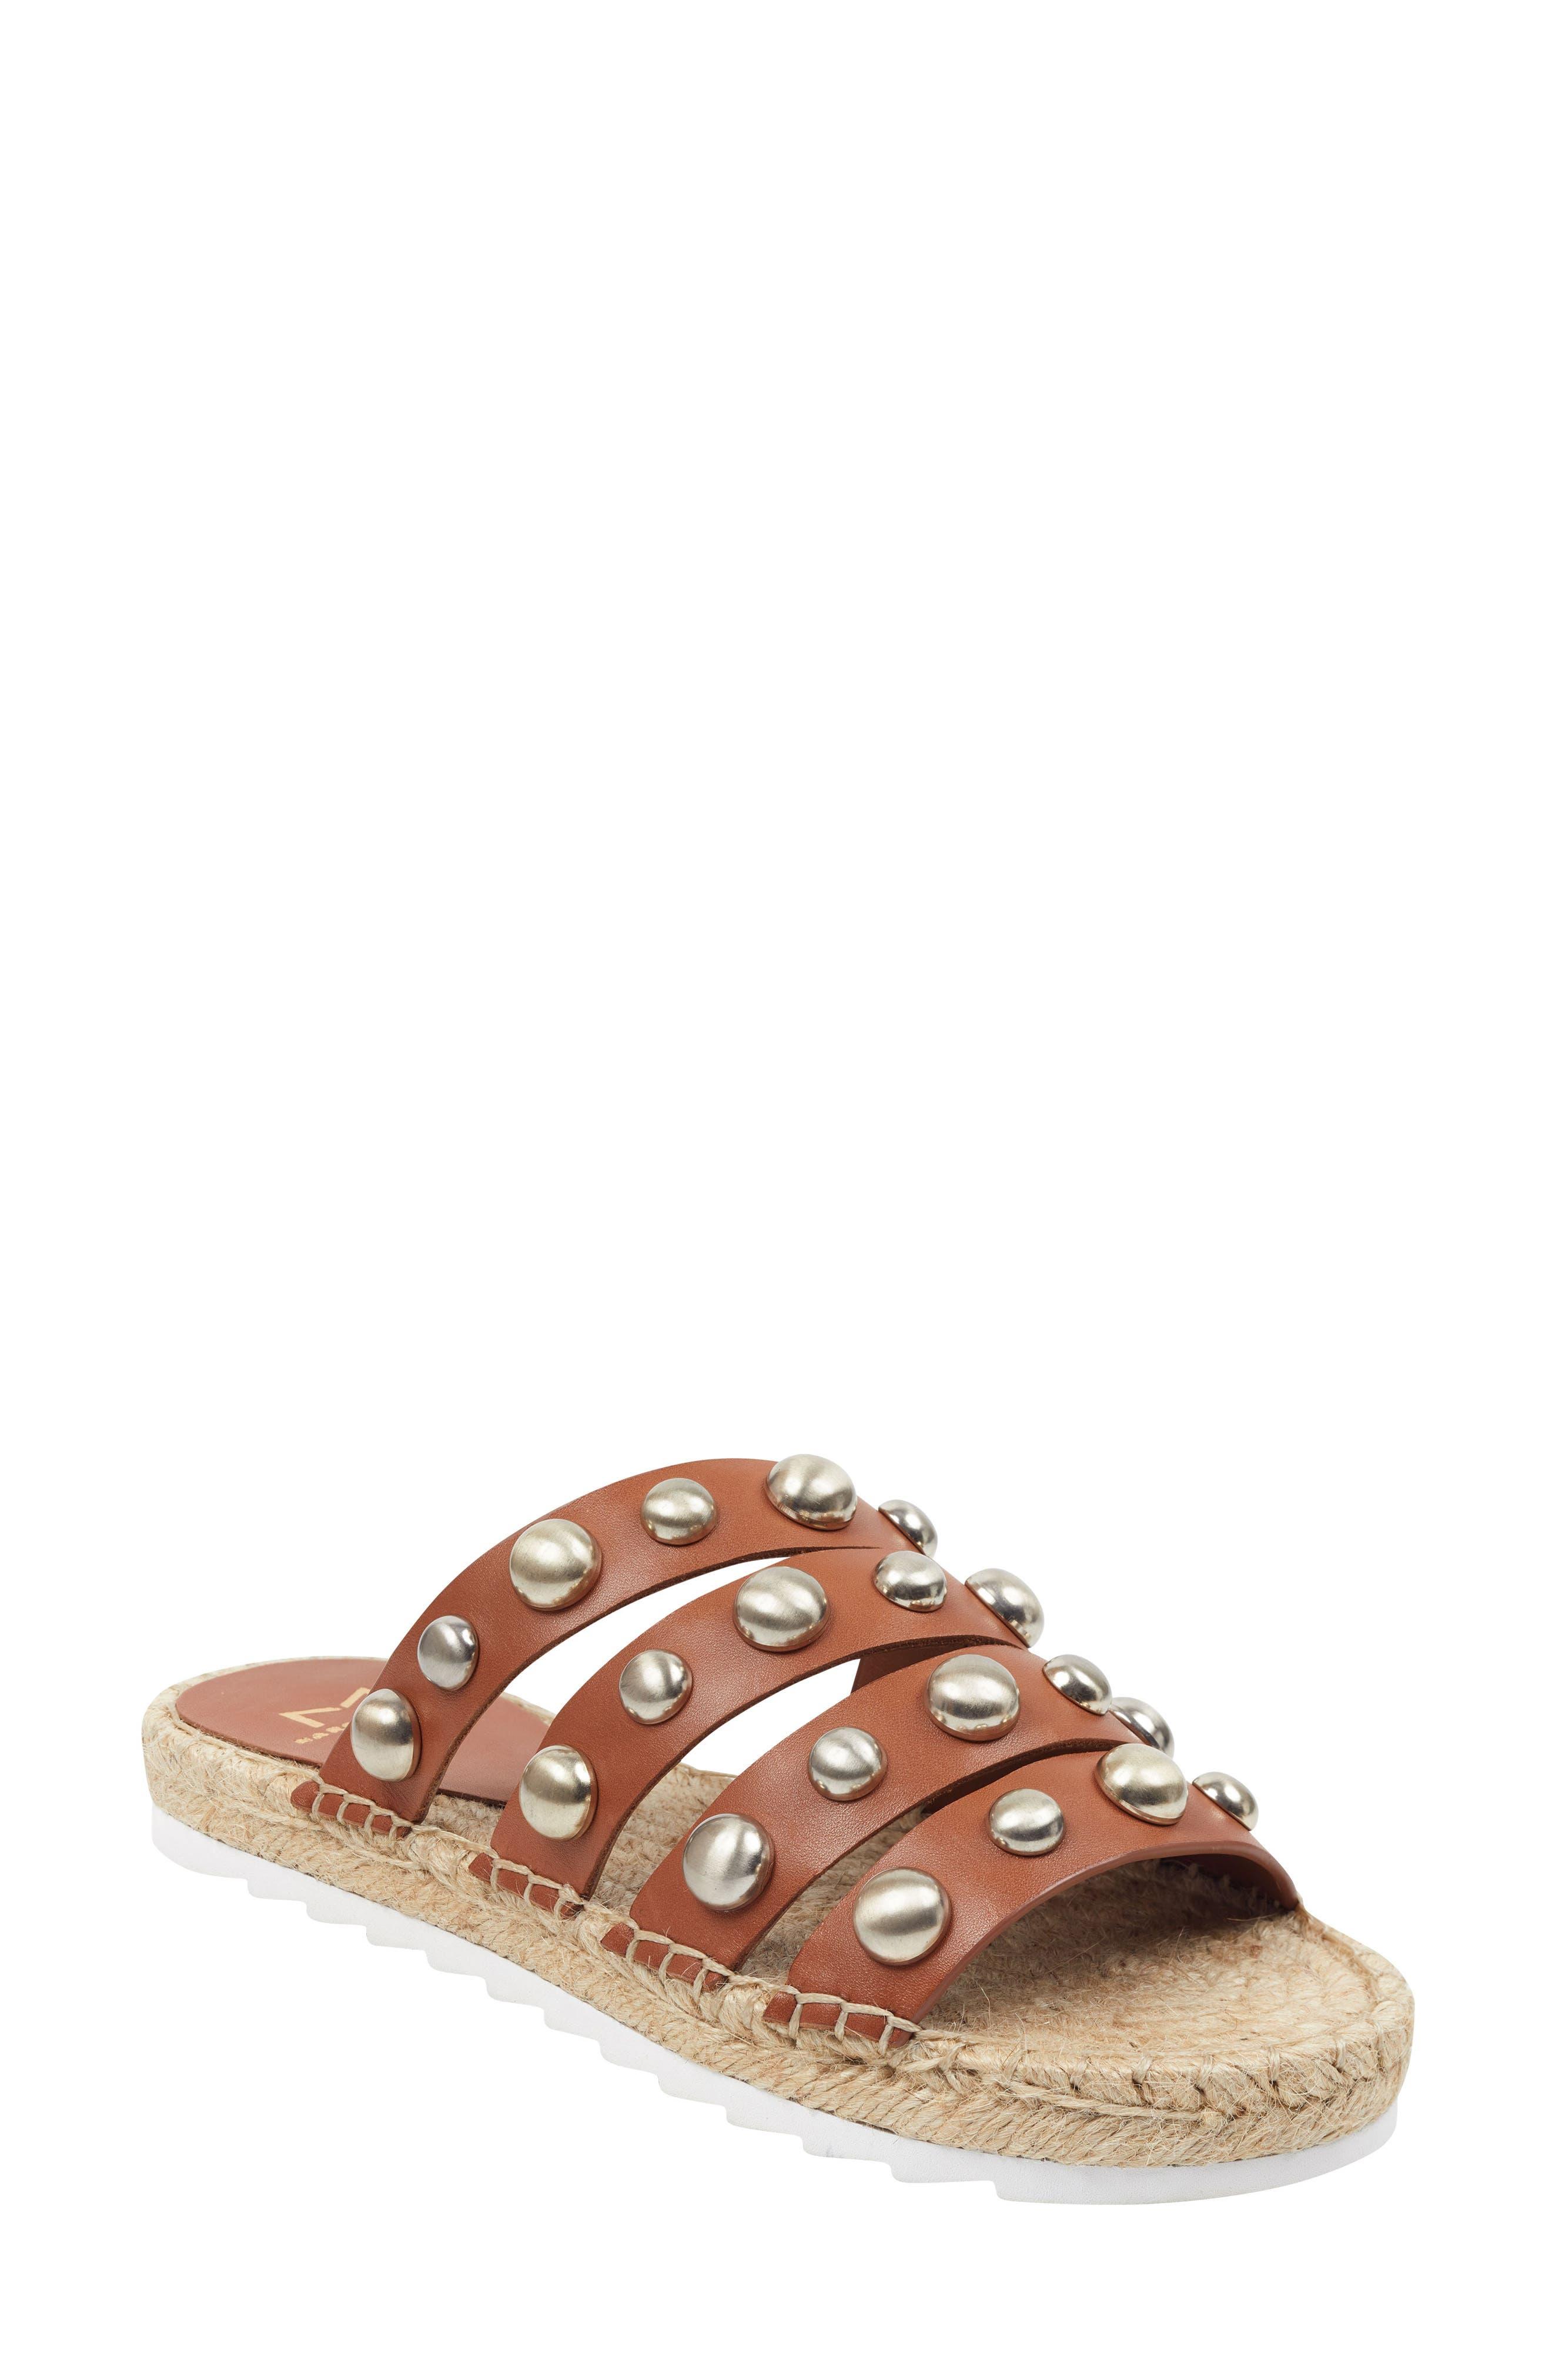 Marc Fisher Ltd Brandie Strappy Studded Slide Sandal, Brown